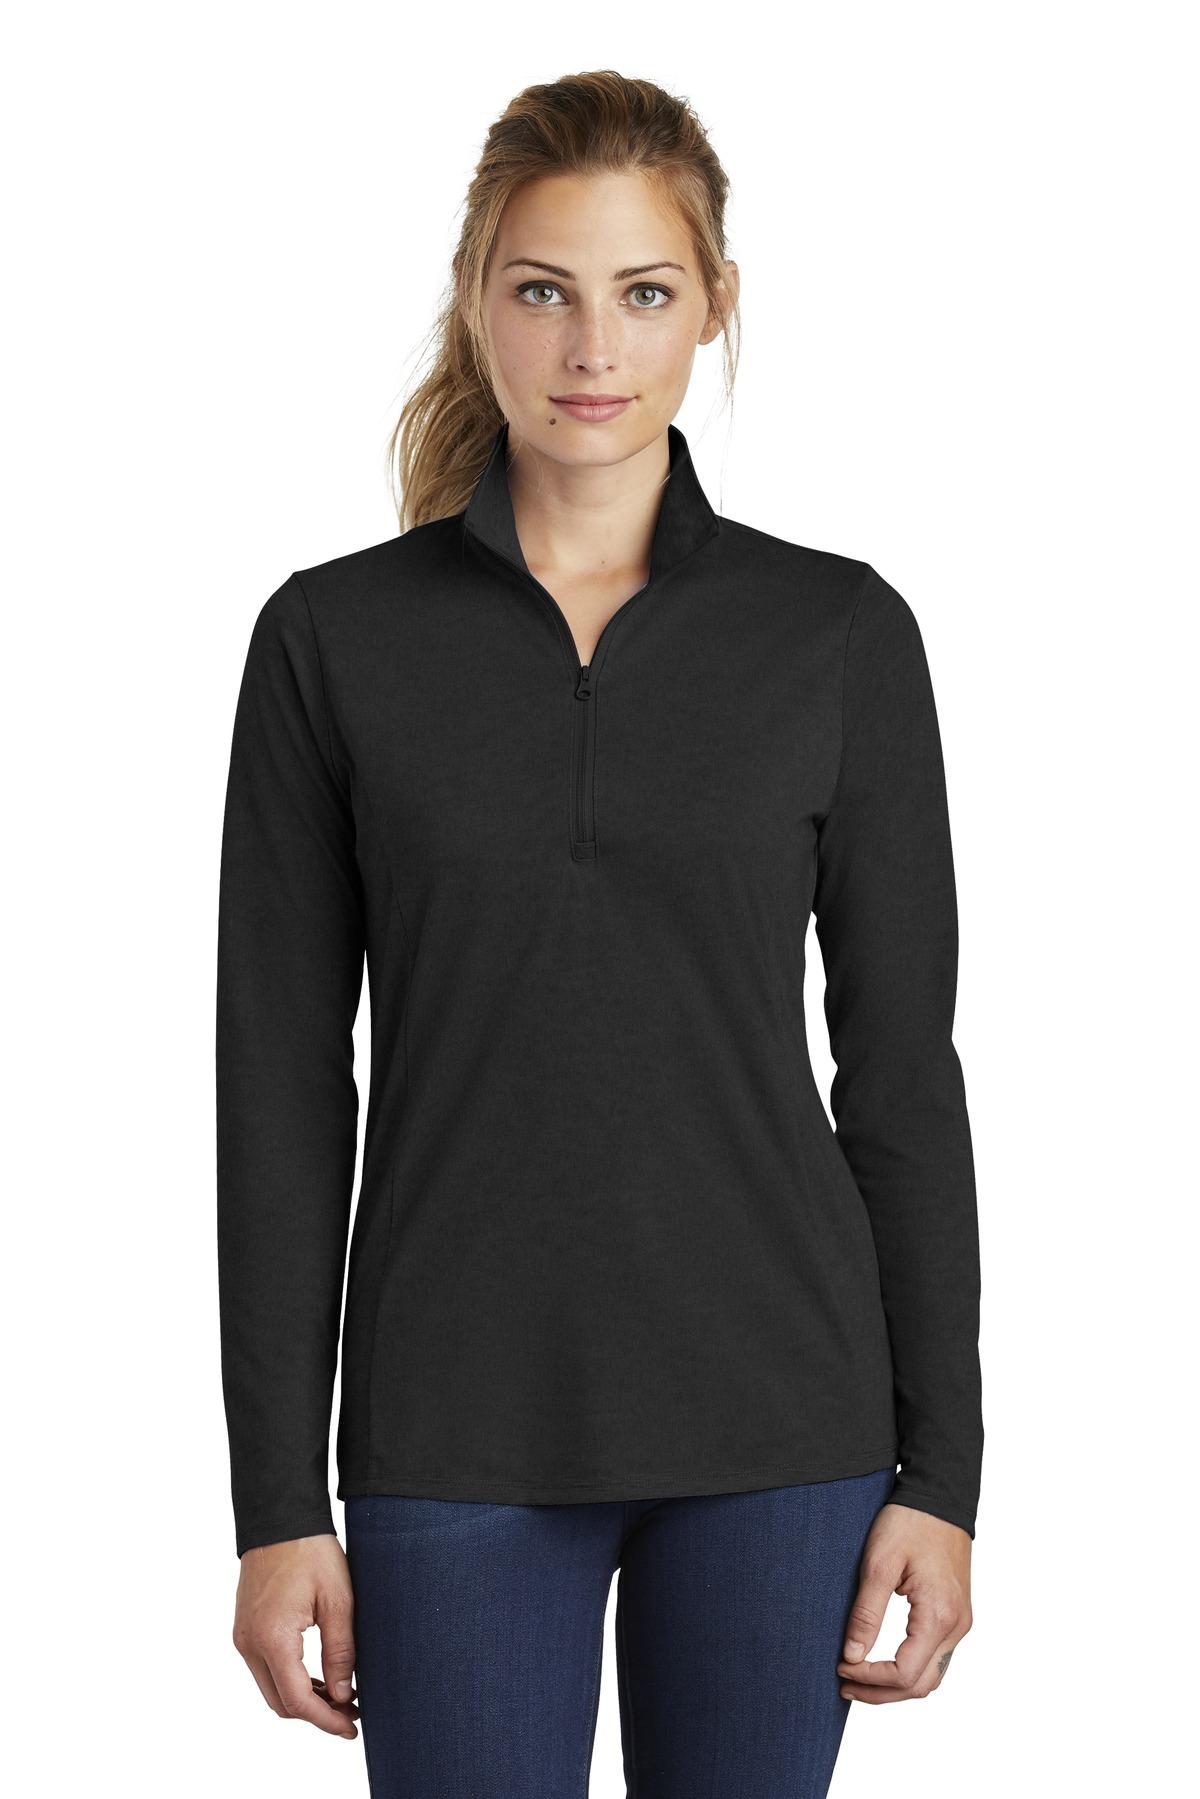 Sport Tek Lst407 Black Triad So Ladies Posicharge Tri Blend Wicking 1 4 Zip Pullover Choose from sleeveless, short sleeve, 3/4 sleeve. https www jiffyshirts com sporttek lst407 html ac black triad so